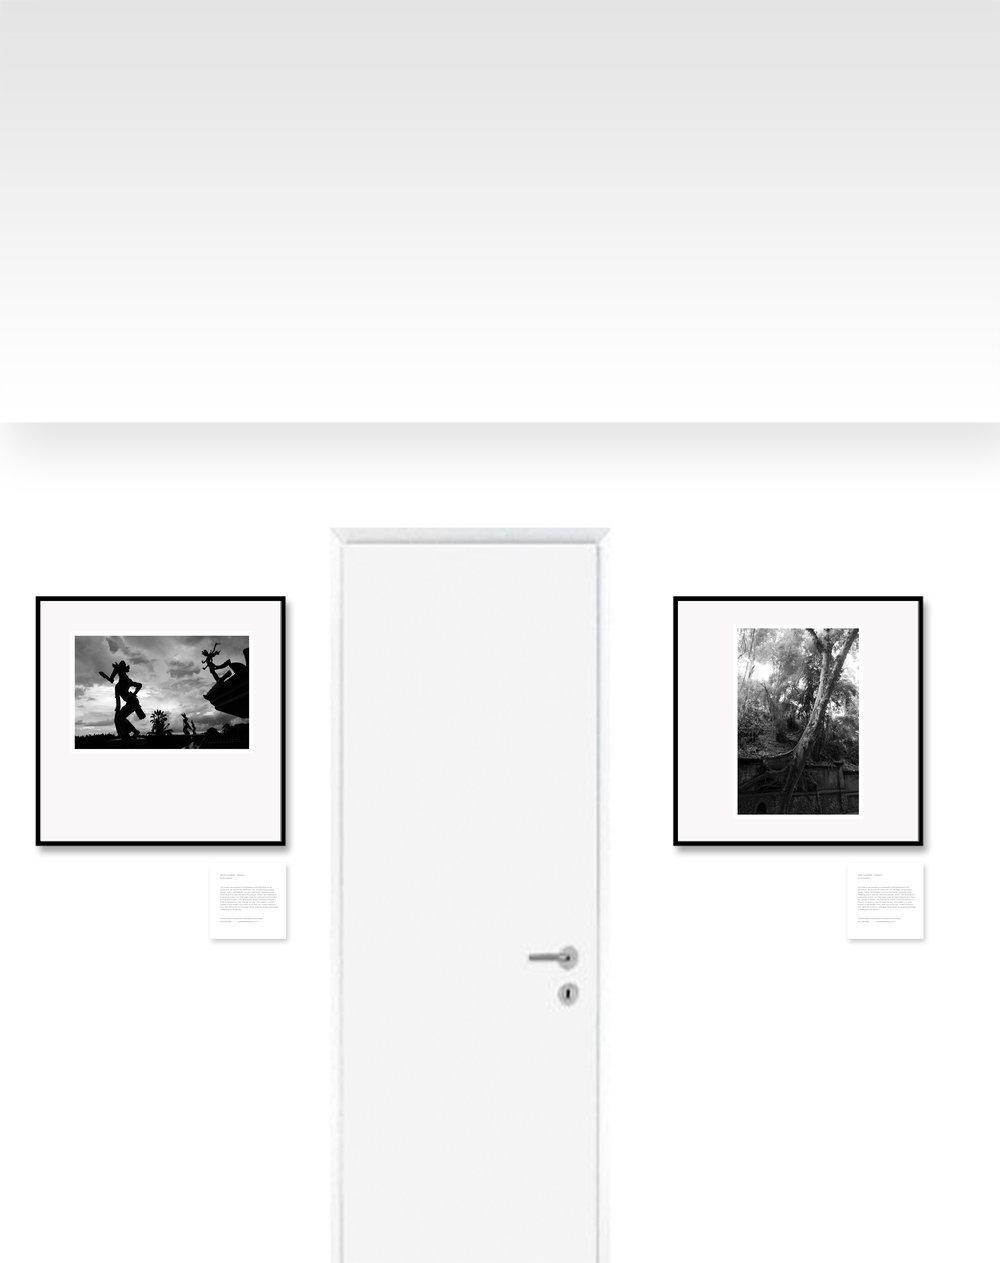 06_Wall6_Closet.jpg